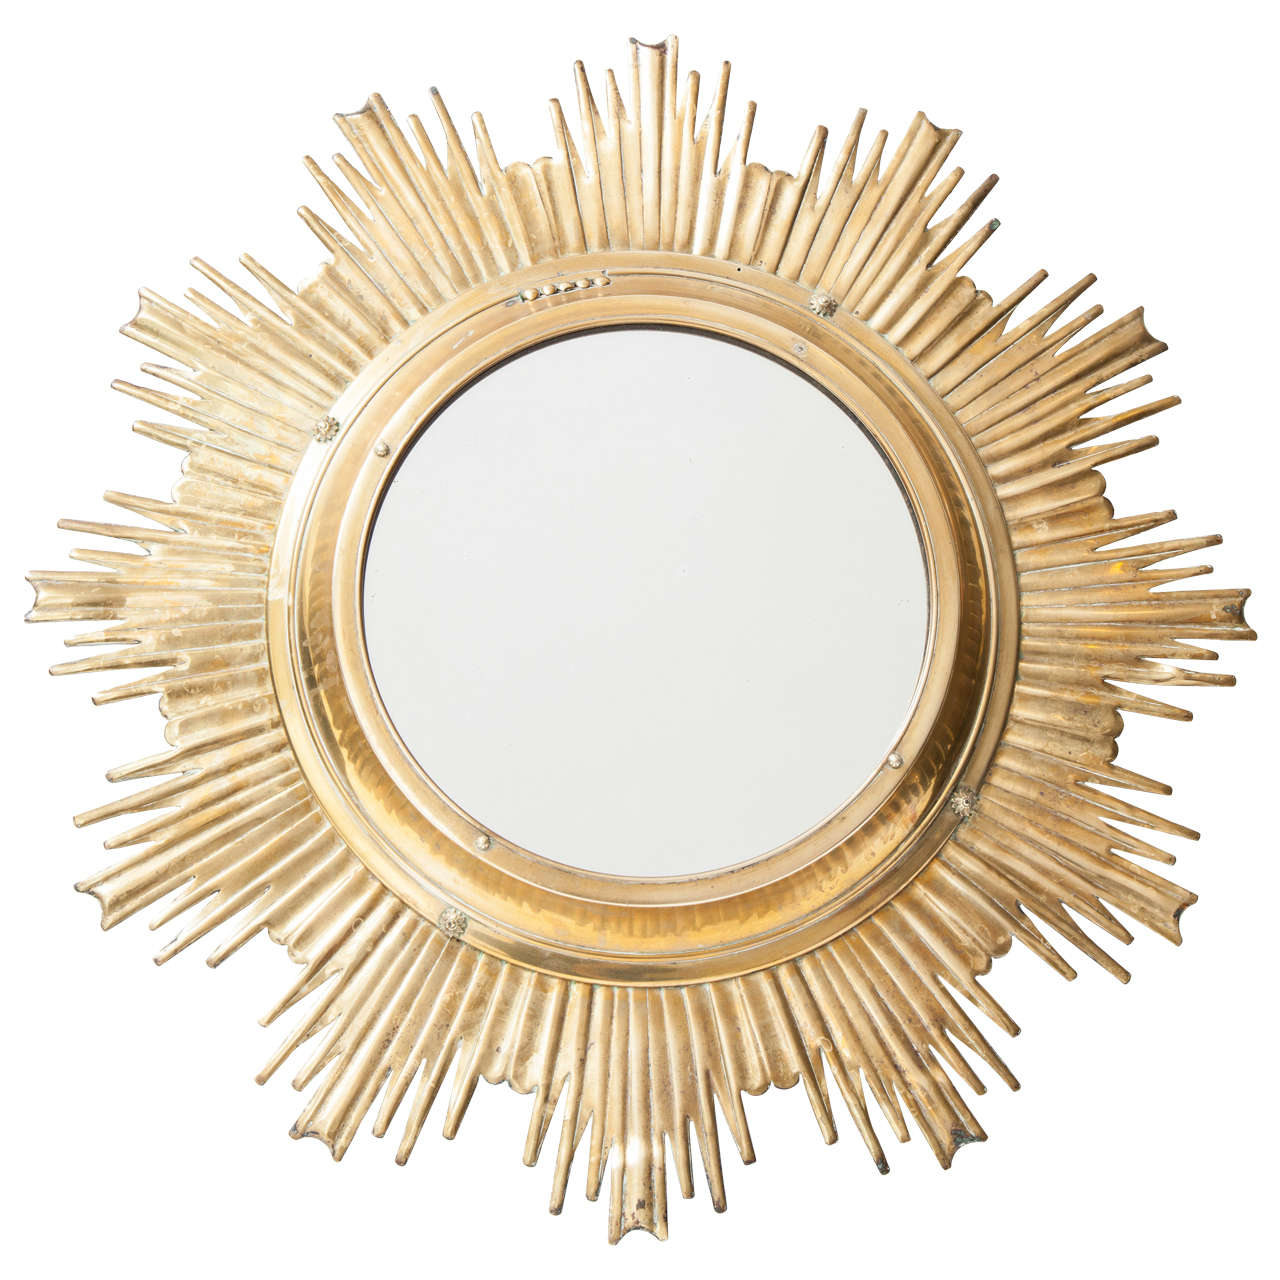 Solid brass high quality sunburst mirror france 1950s for for Sunburst mirror